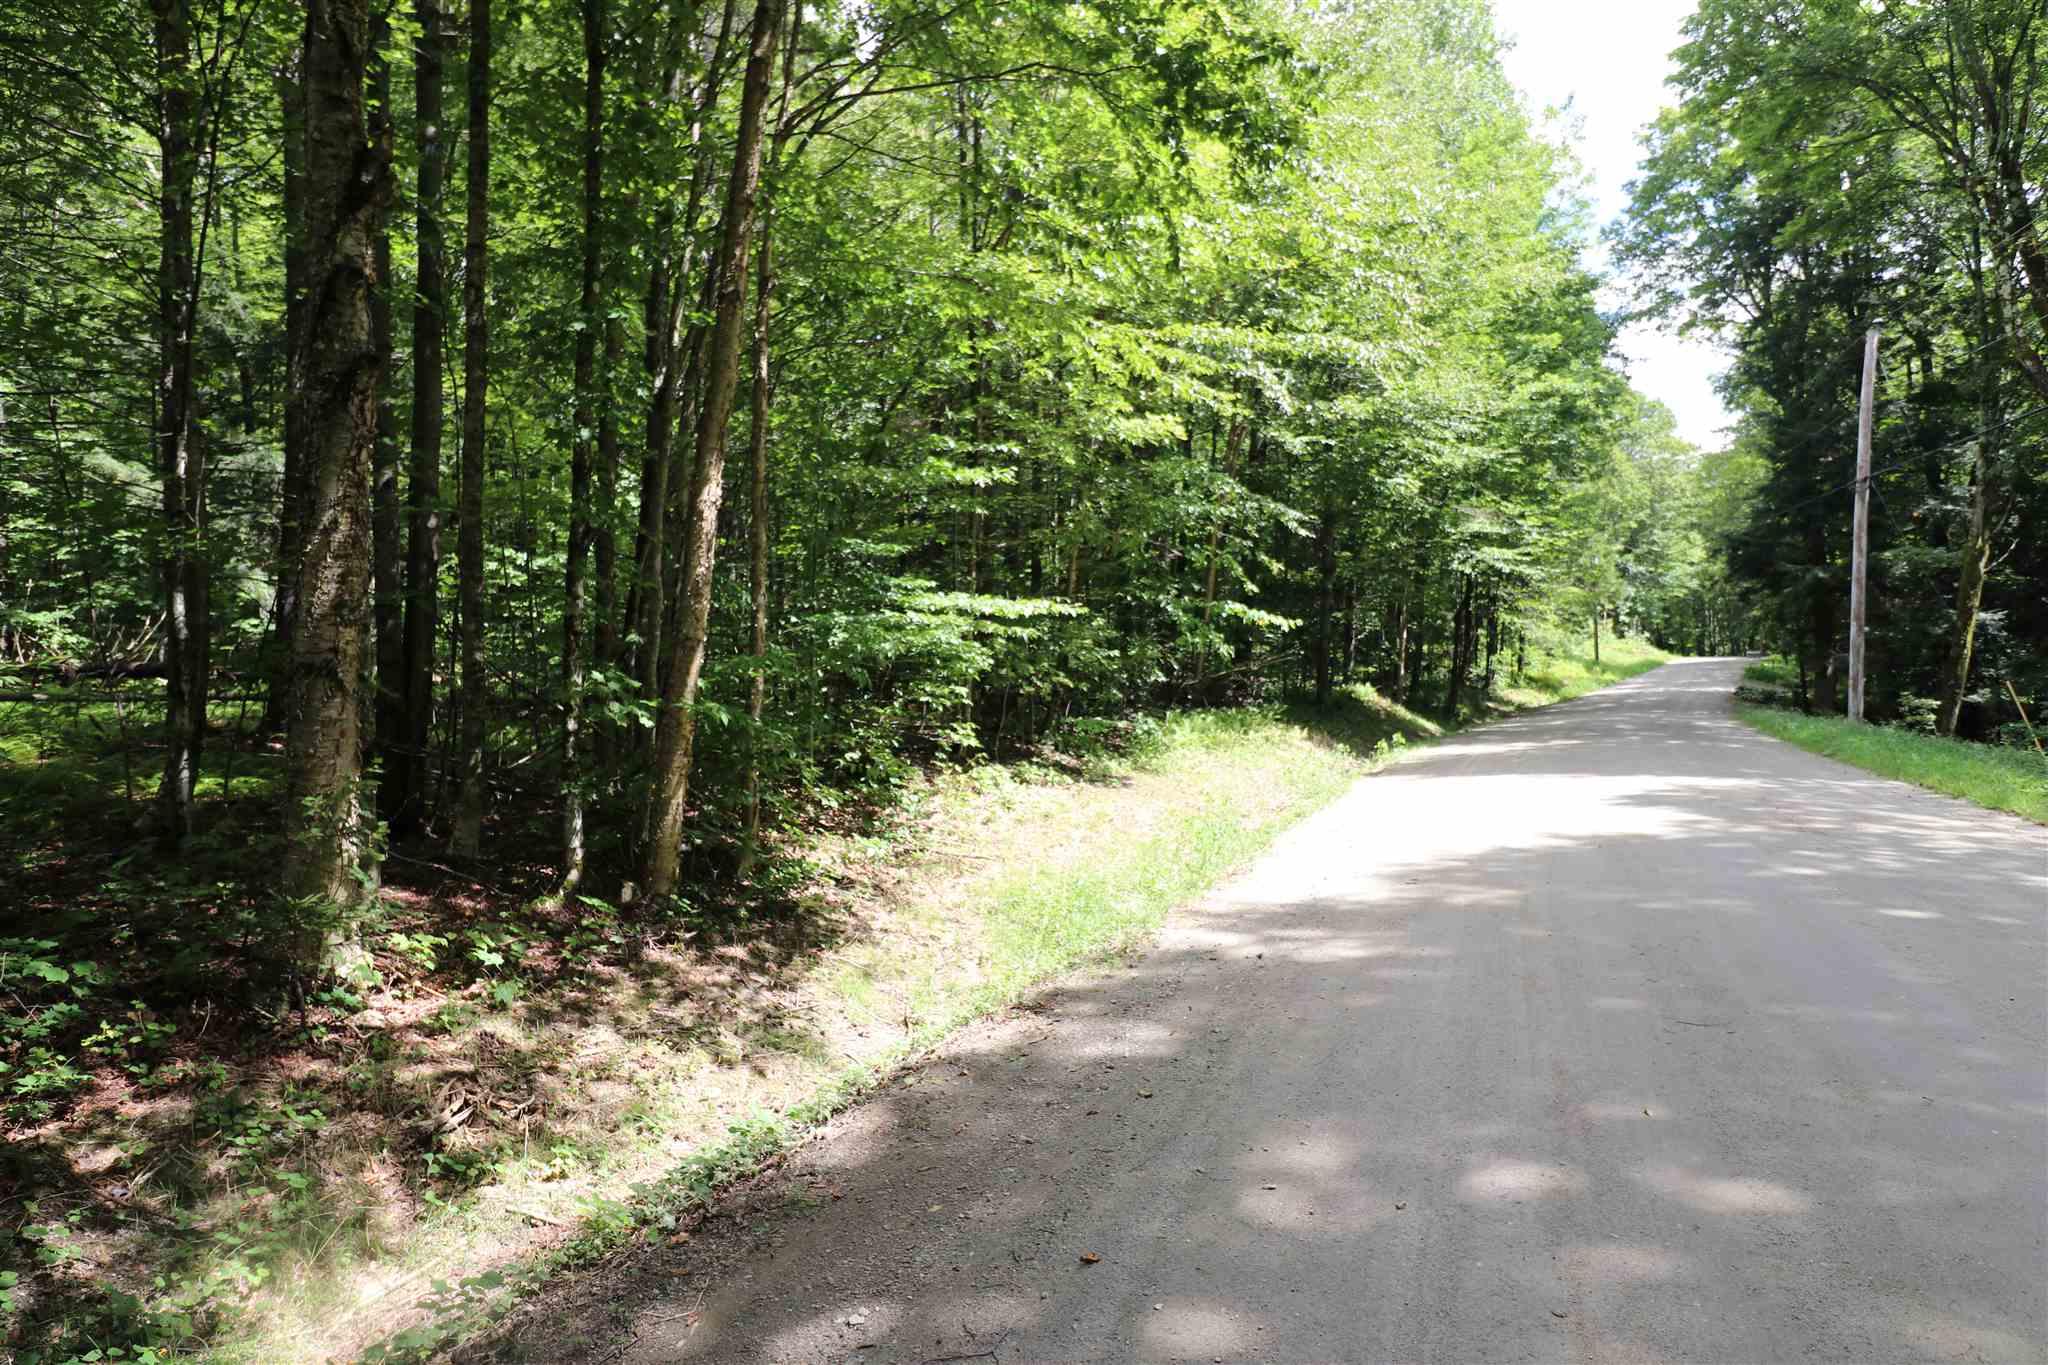 Phen Basin Road